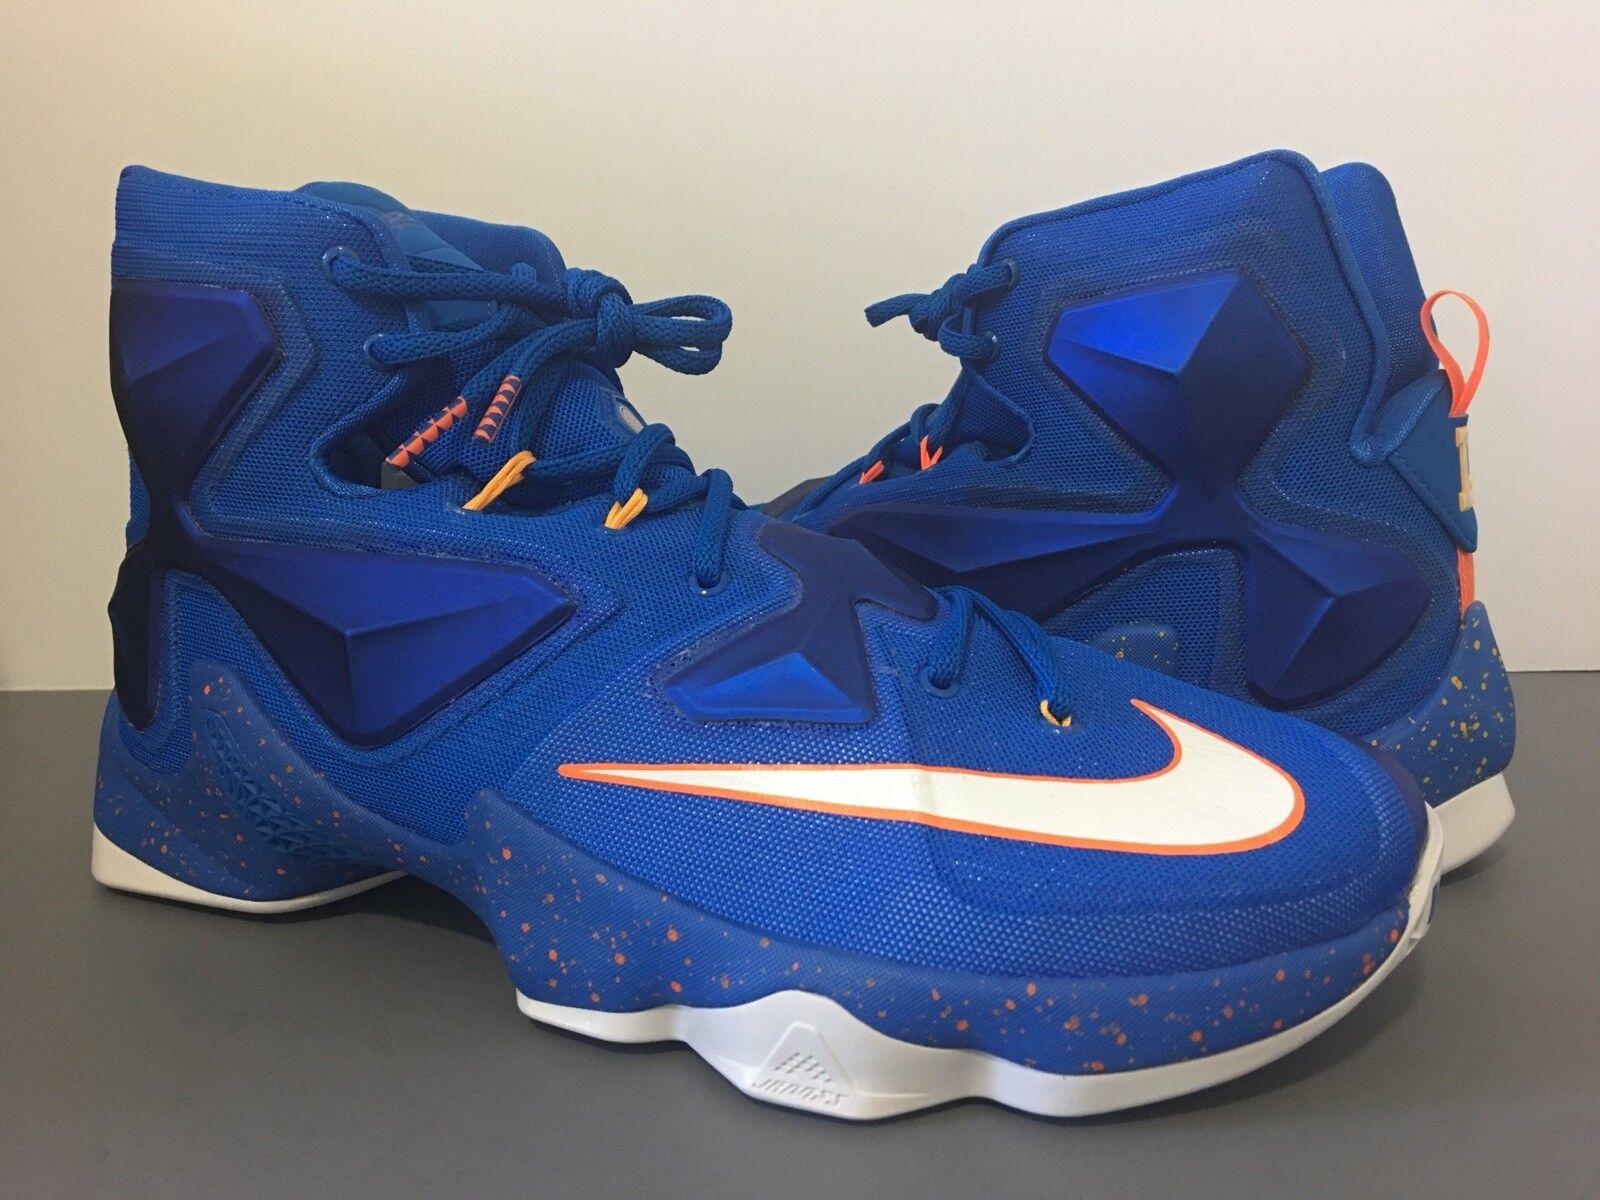 Nike lebron james 807219-418 xiii männer ist basketball - schuhe 807219-418 james sz 12 66c6c2